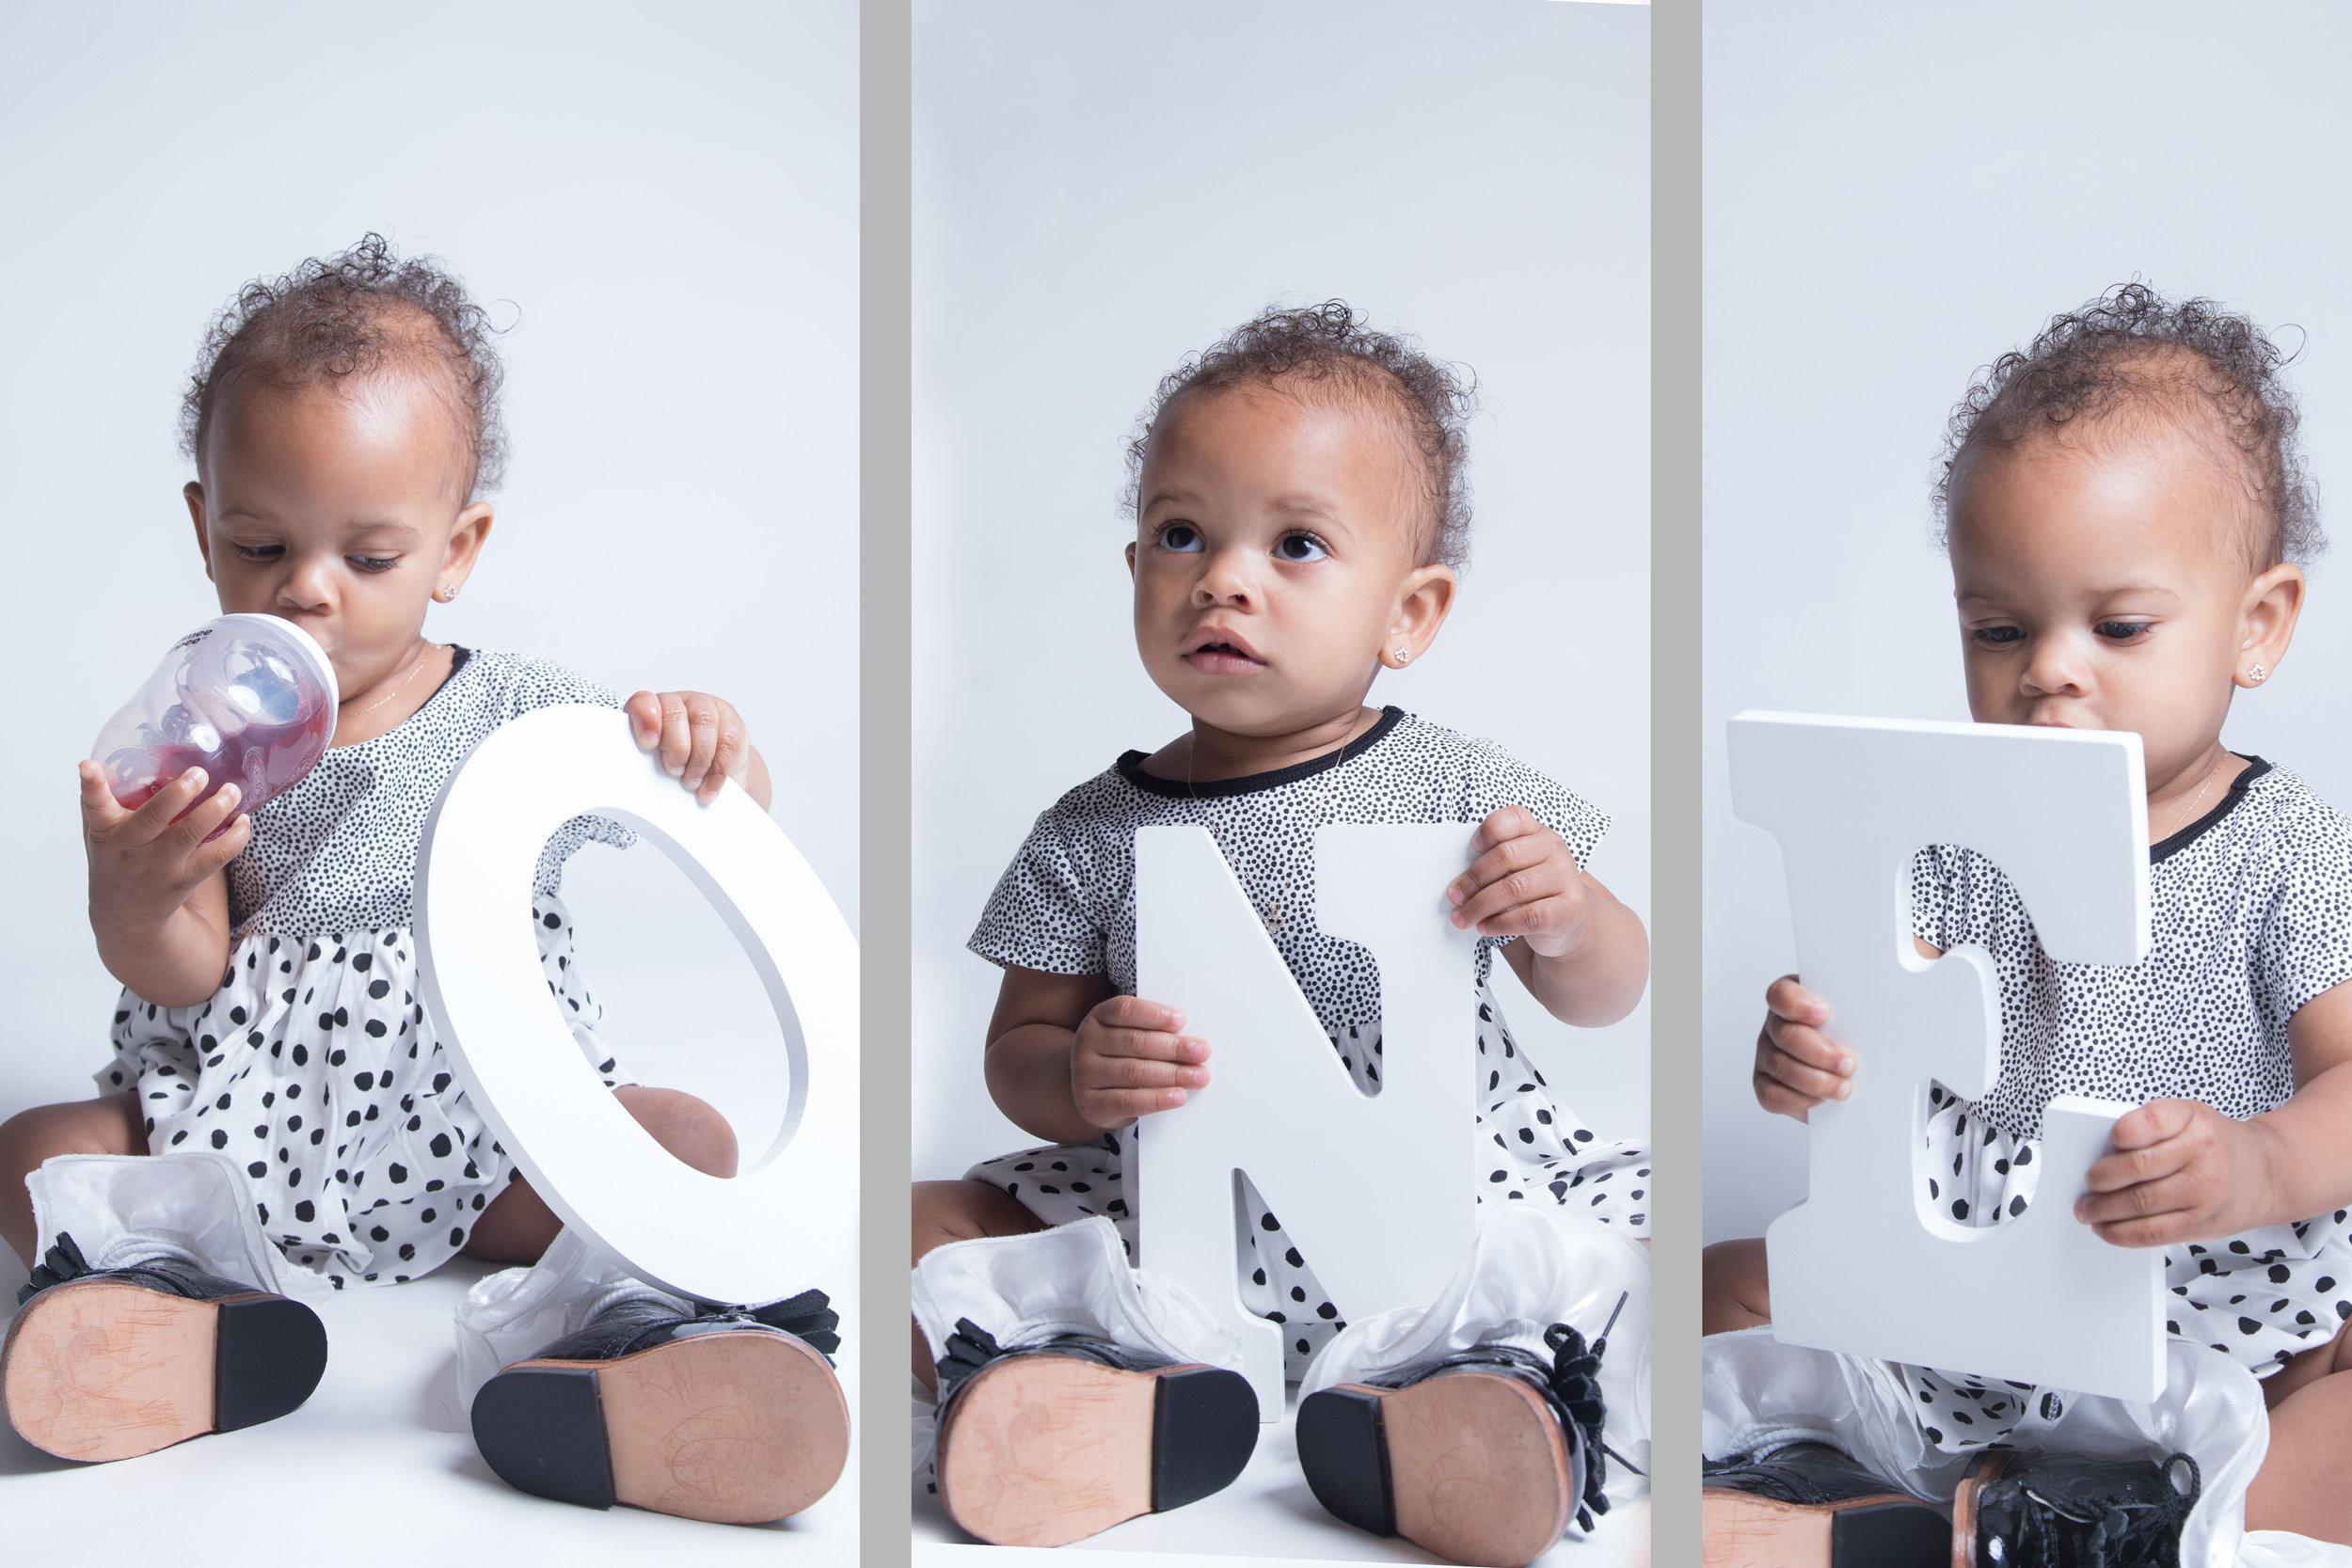 baby-photo-shoot-chamber-photography-antoine-hart-7.jpg